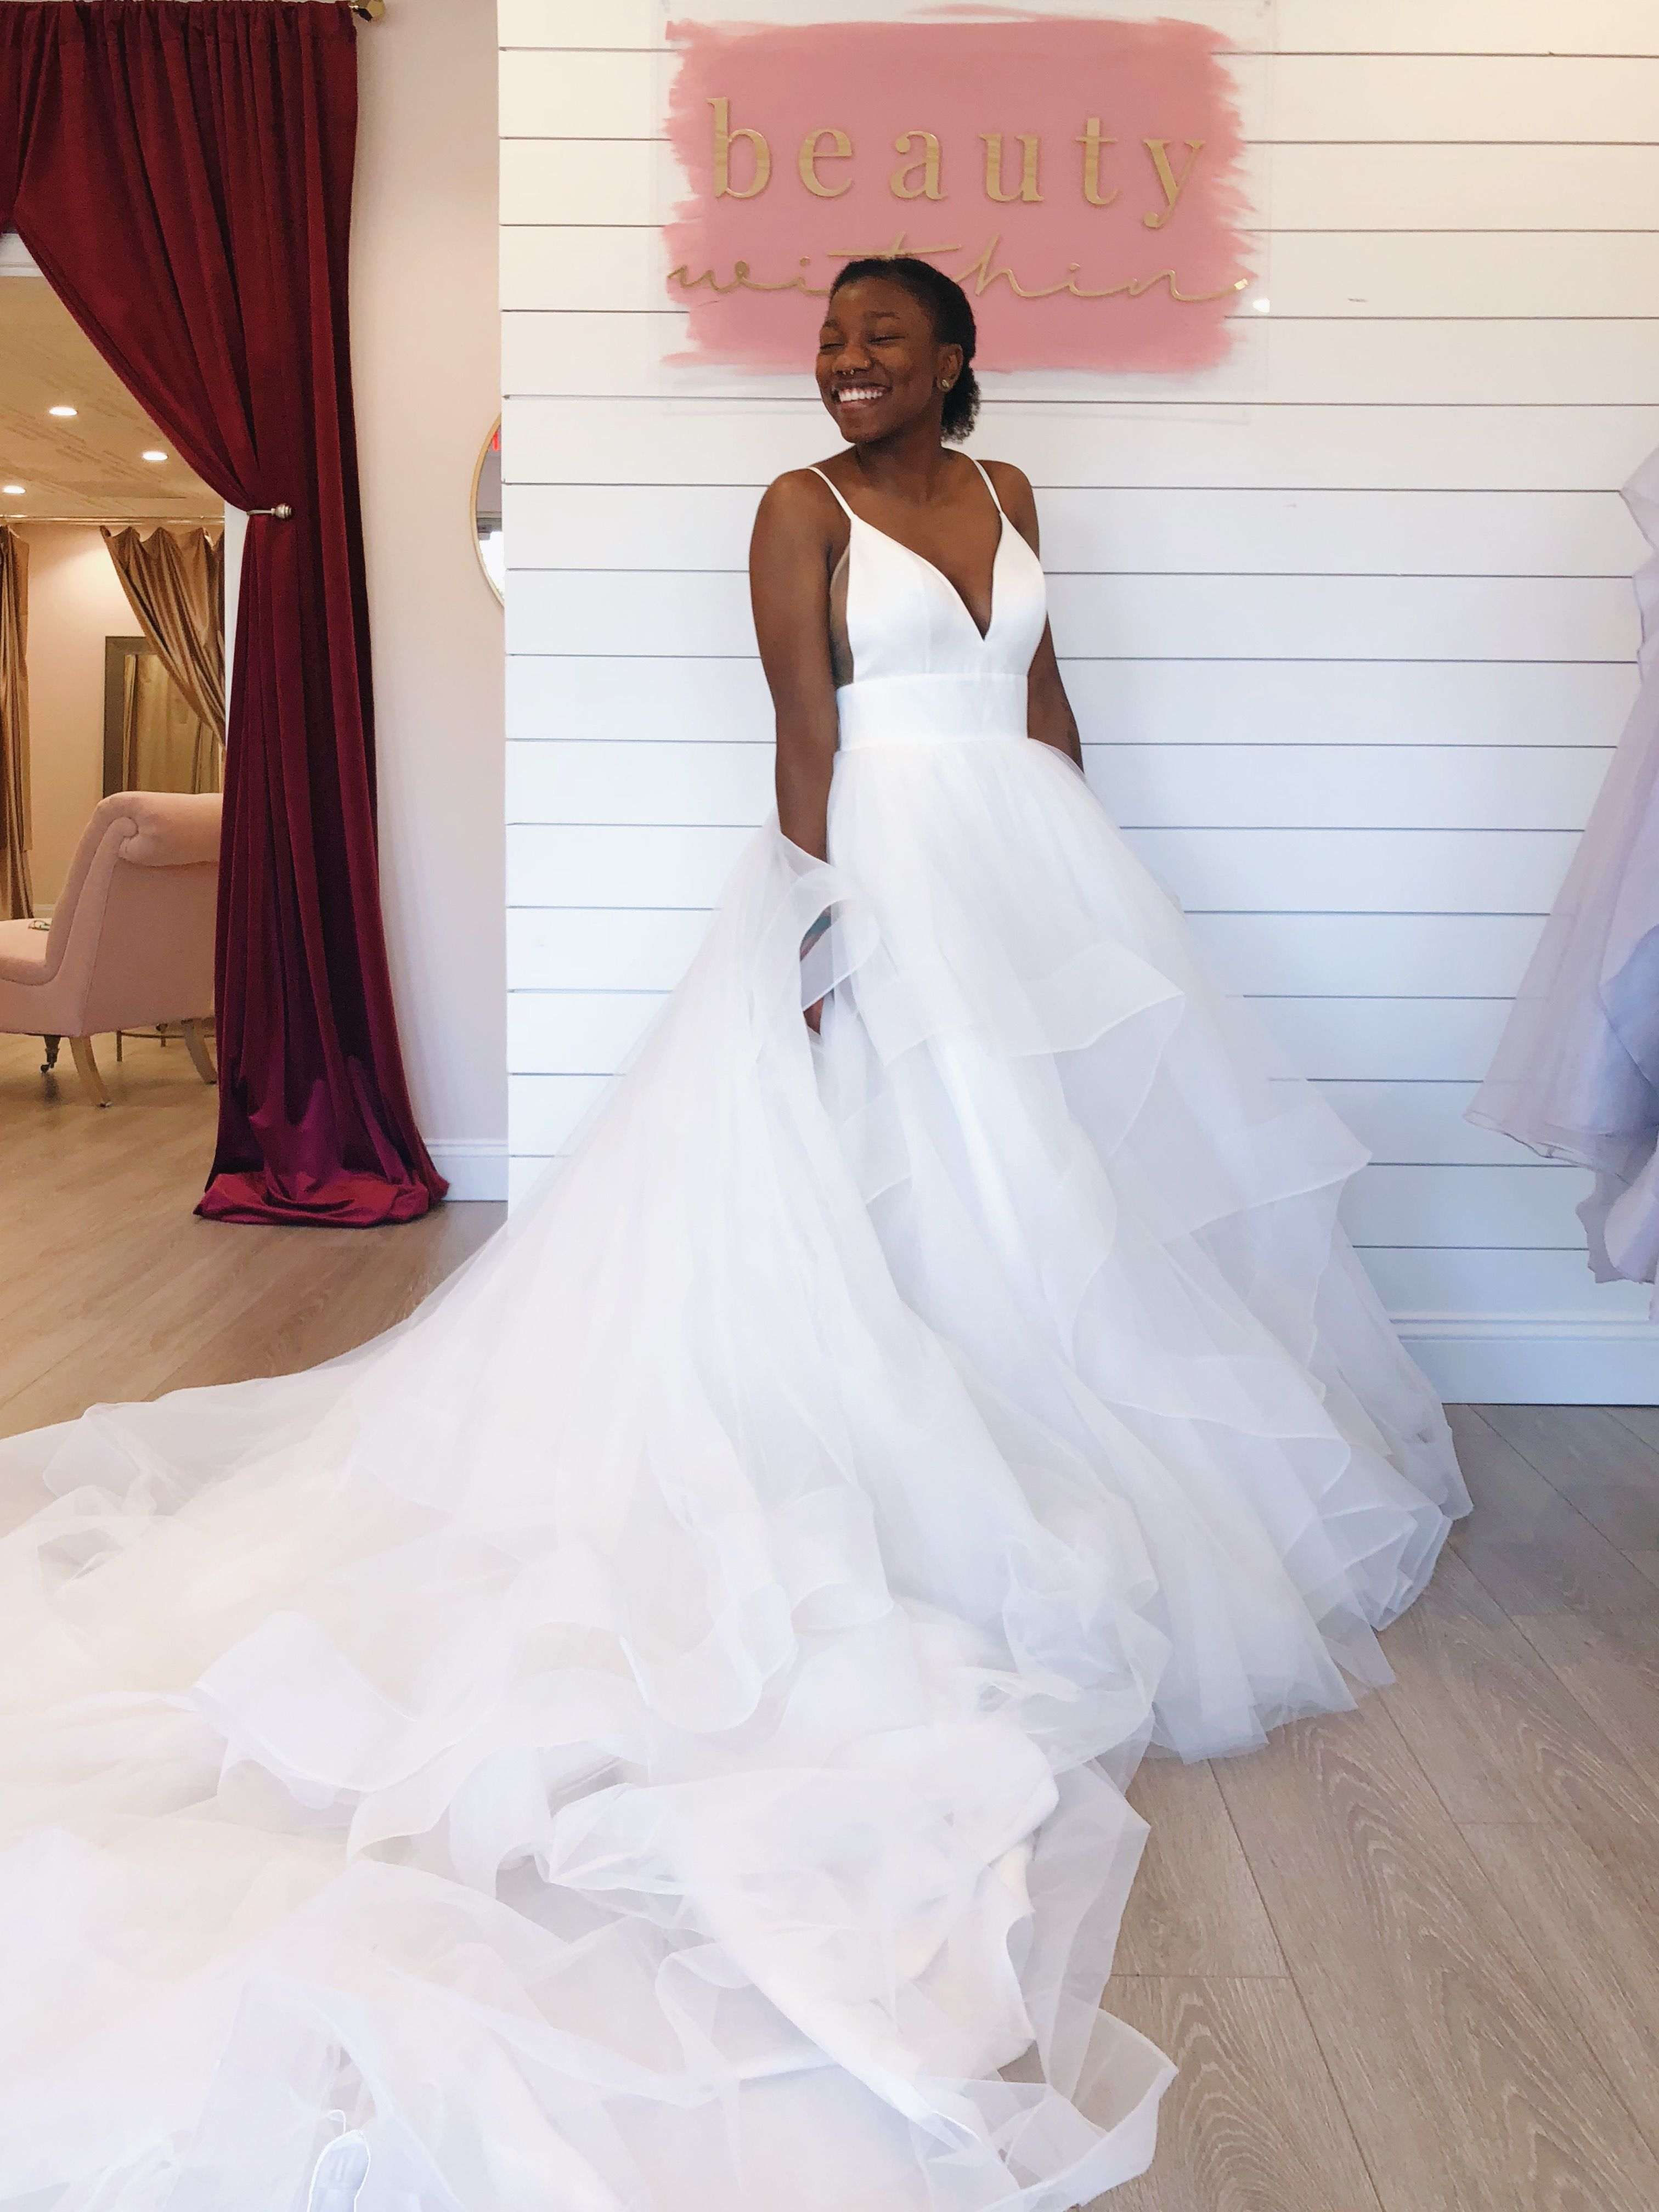 Long, ruffle train on wedding dress   Bridal looks, Bridal ...